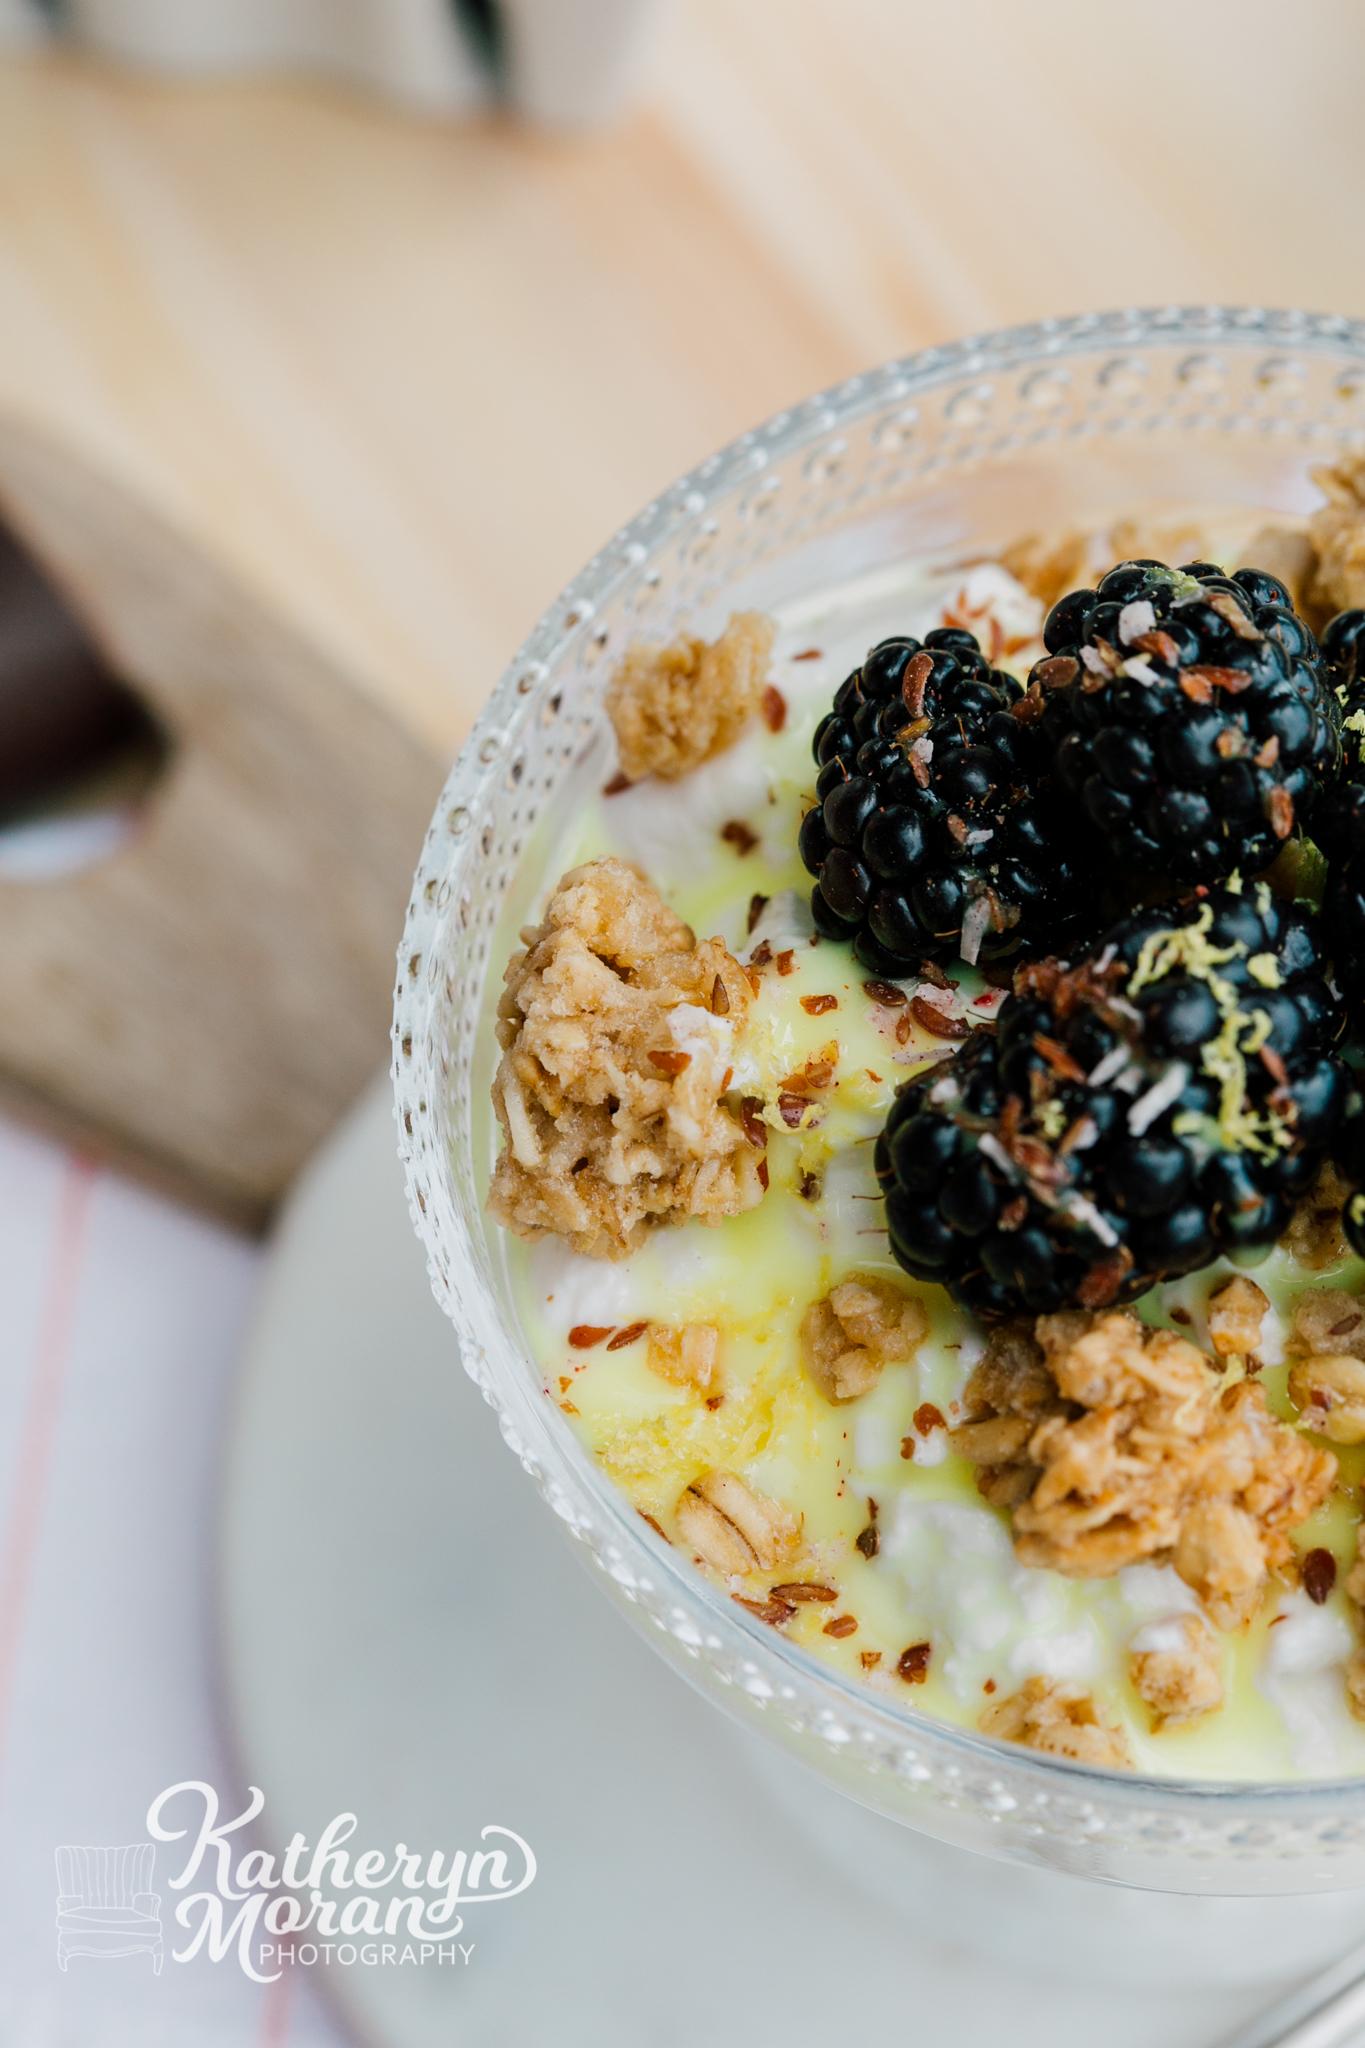 bellingham-food-photographer-katheryn-moran-barleans-dressings-omega3-12.jpg